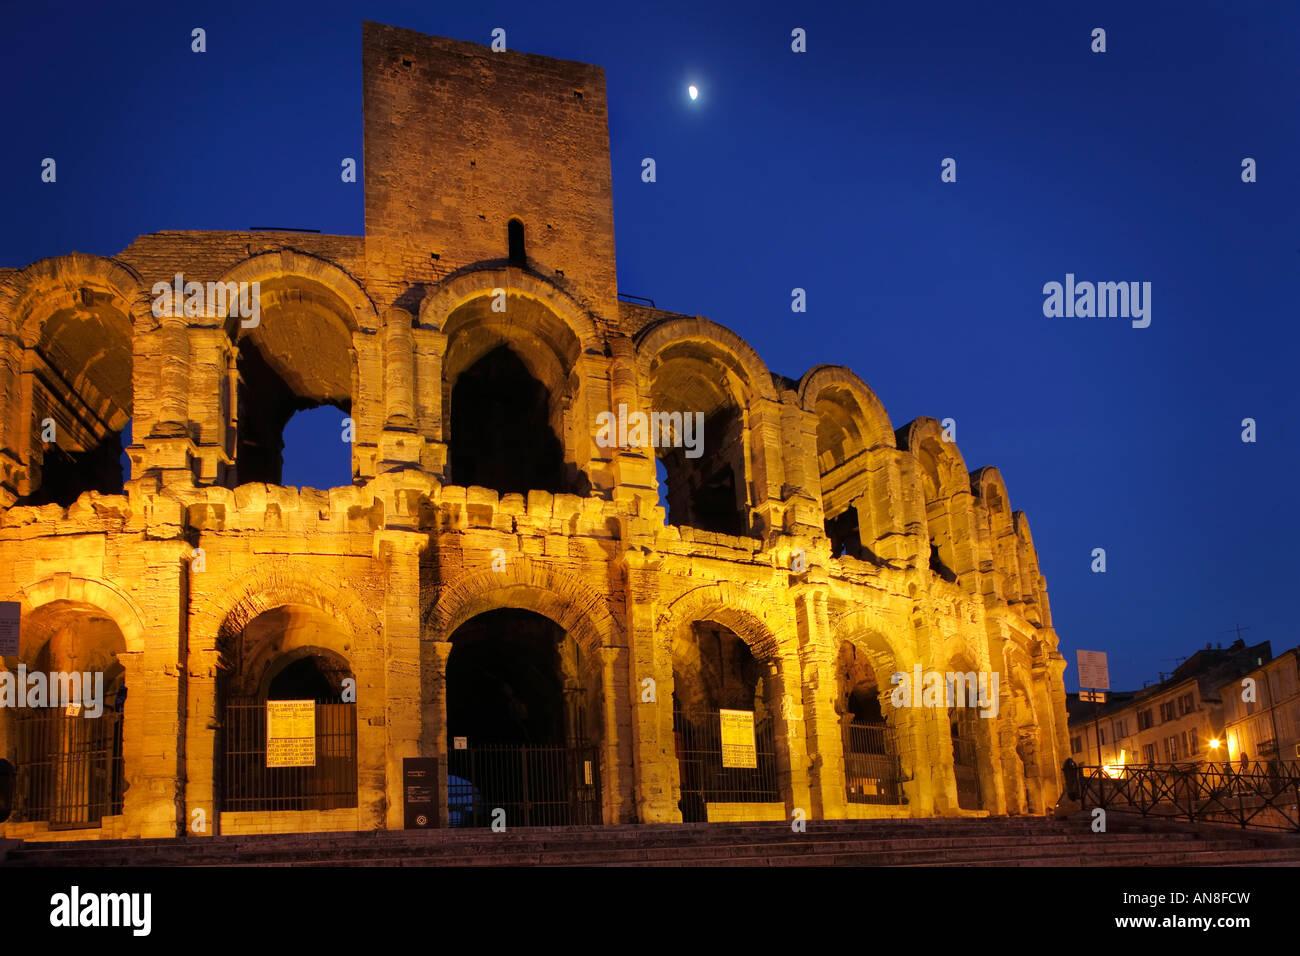 Arles Roman Arena - Stock Image